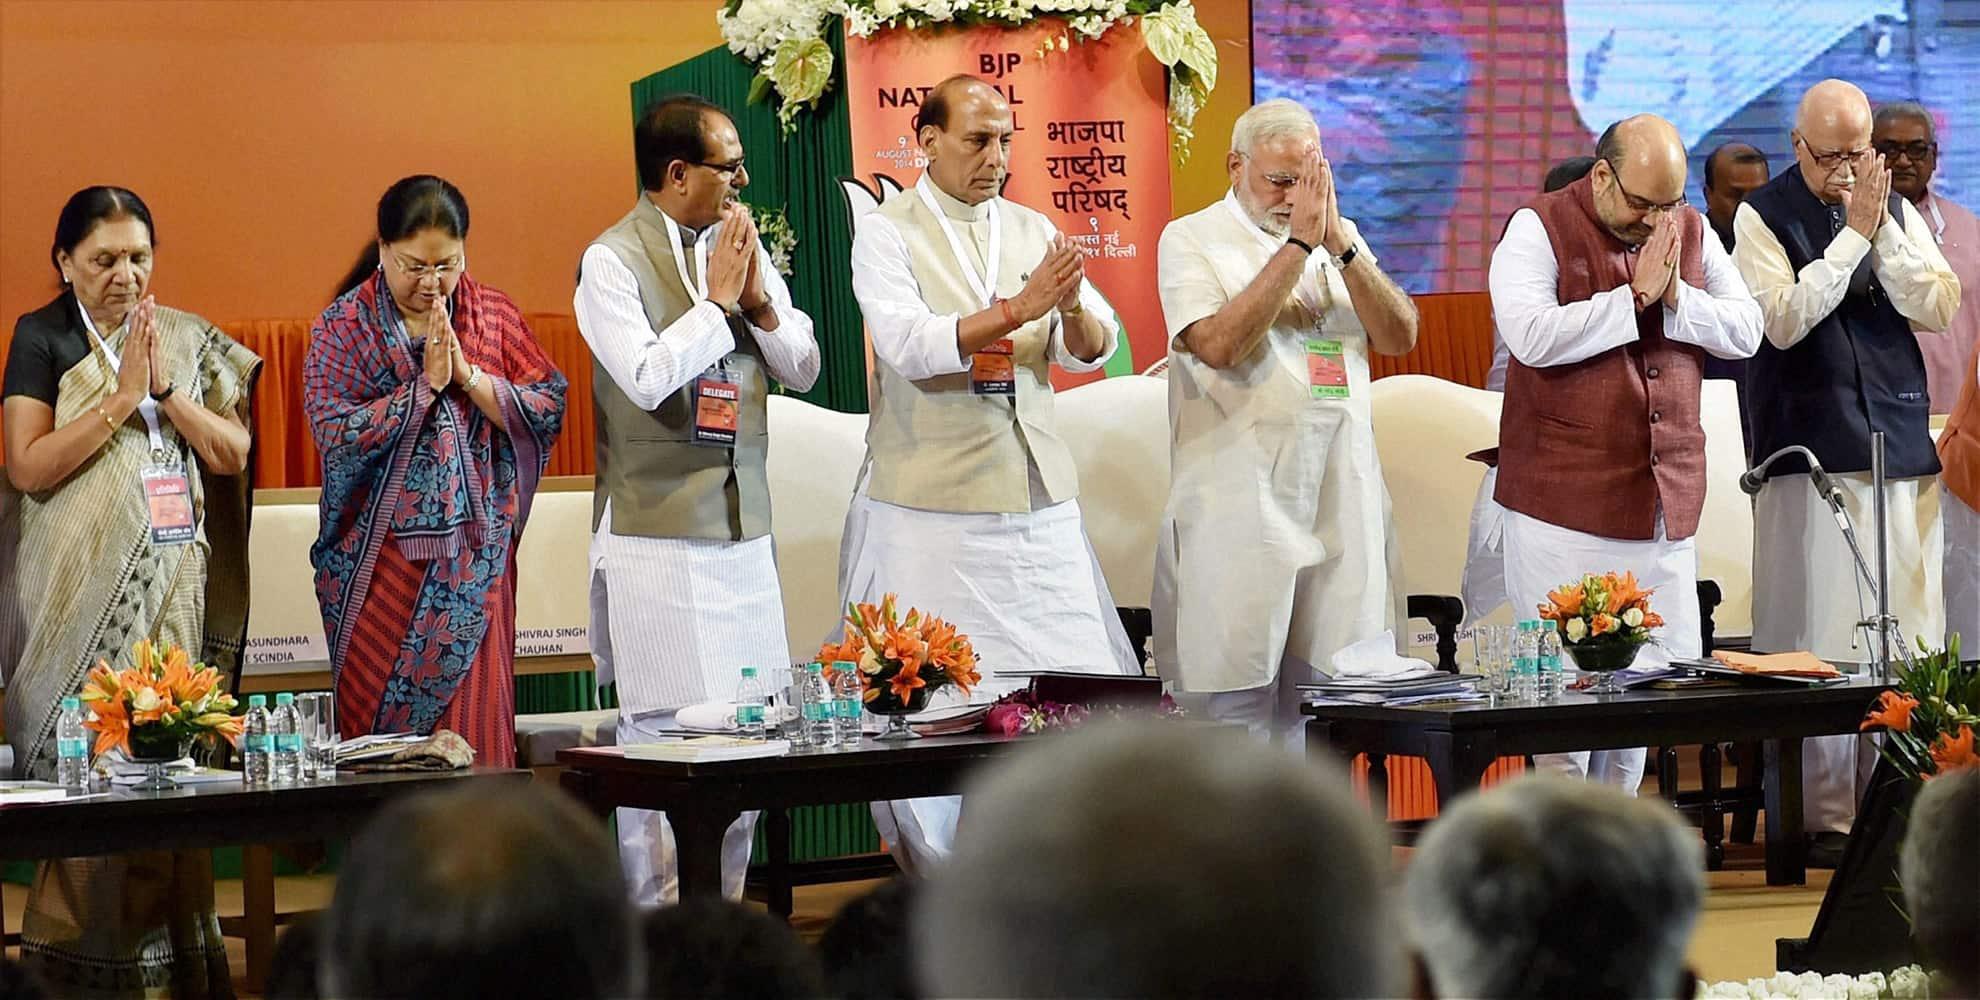 Prime Minister Narendra Modi, BJP President Amit Shah, LK Advani, M M Joshi, Rajnath Singh, M Venkaiah Naidu, Arun Jaitley and other senior leaders during the party`s National Council meet in New Delhi.